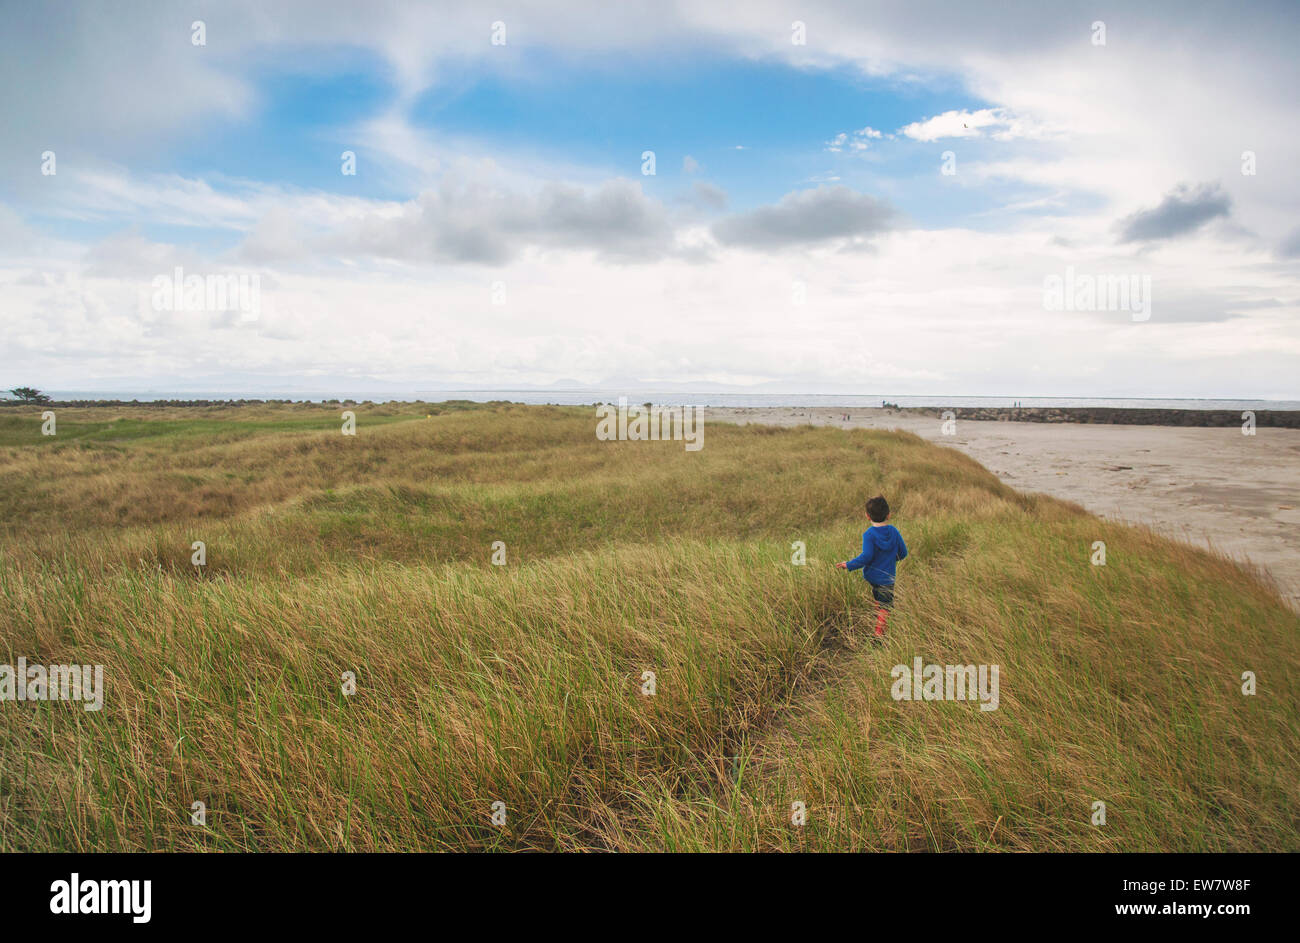 Boy running through grass on beach - Stock Image